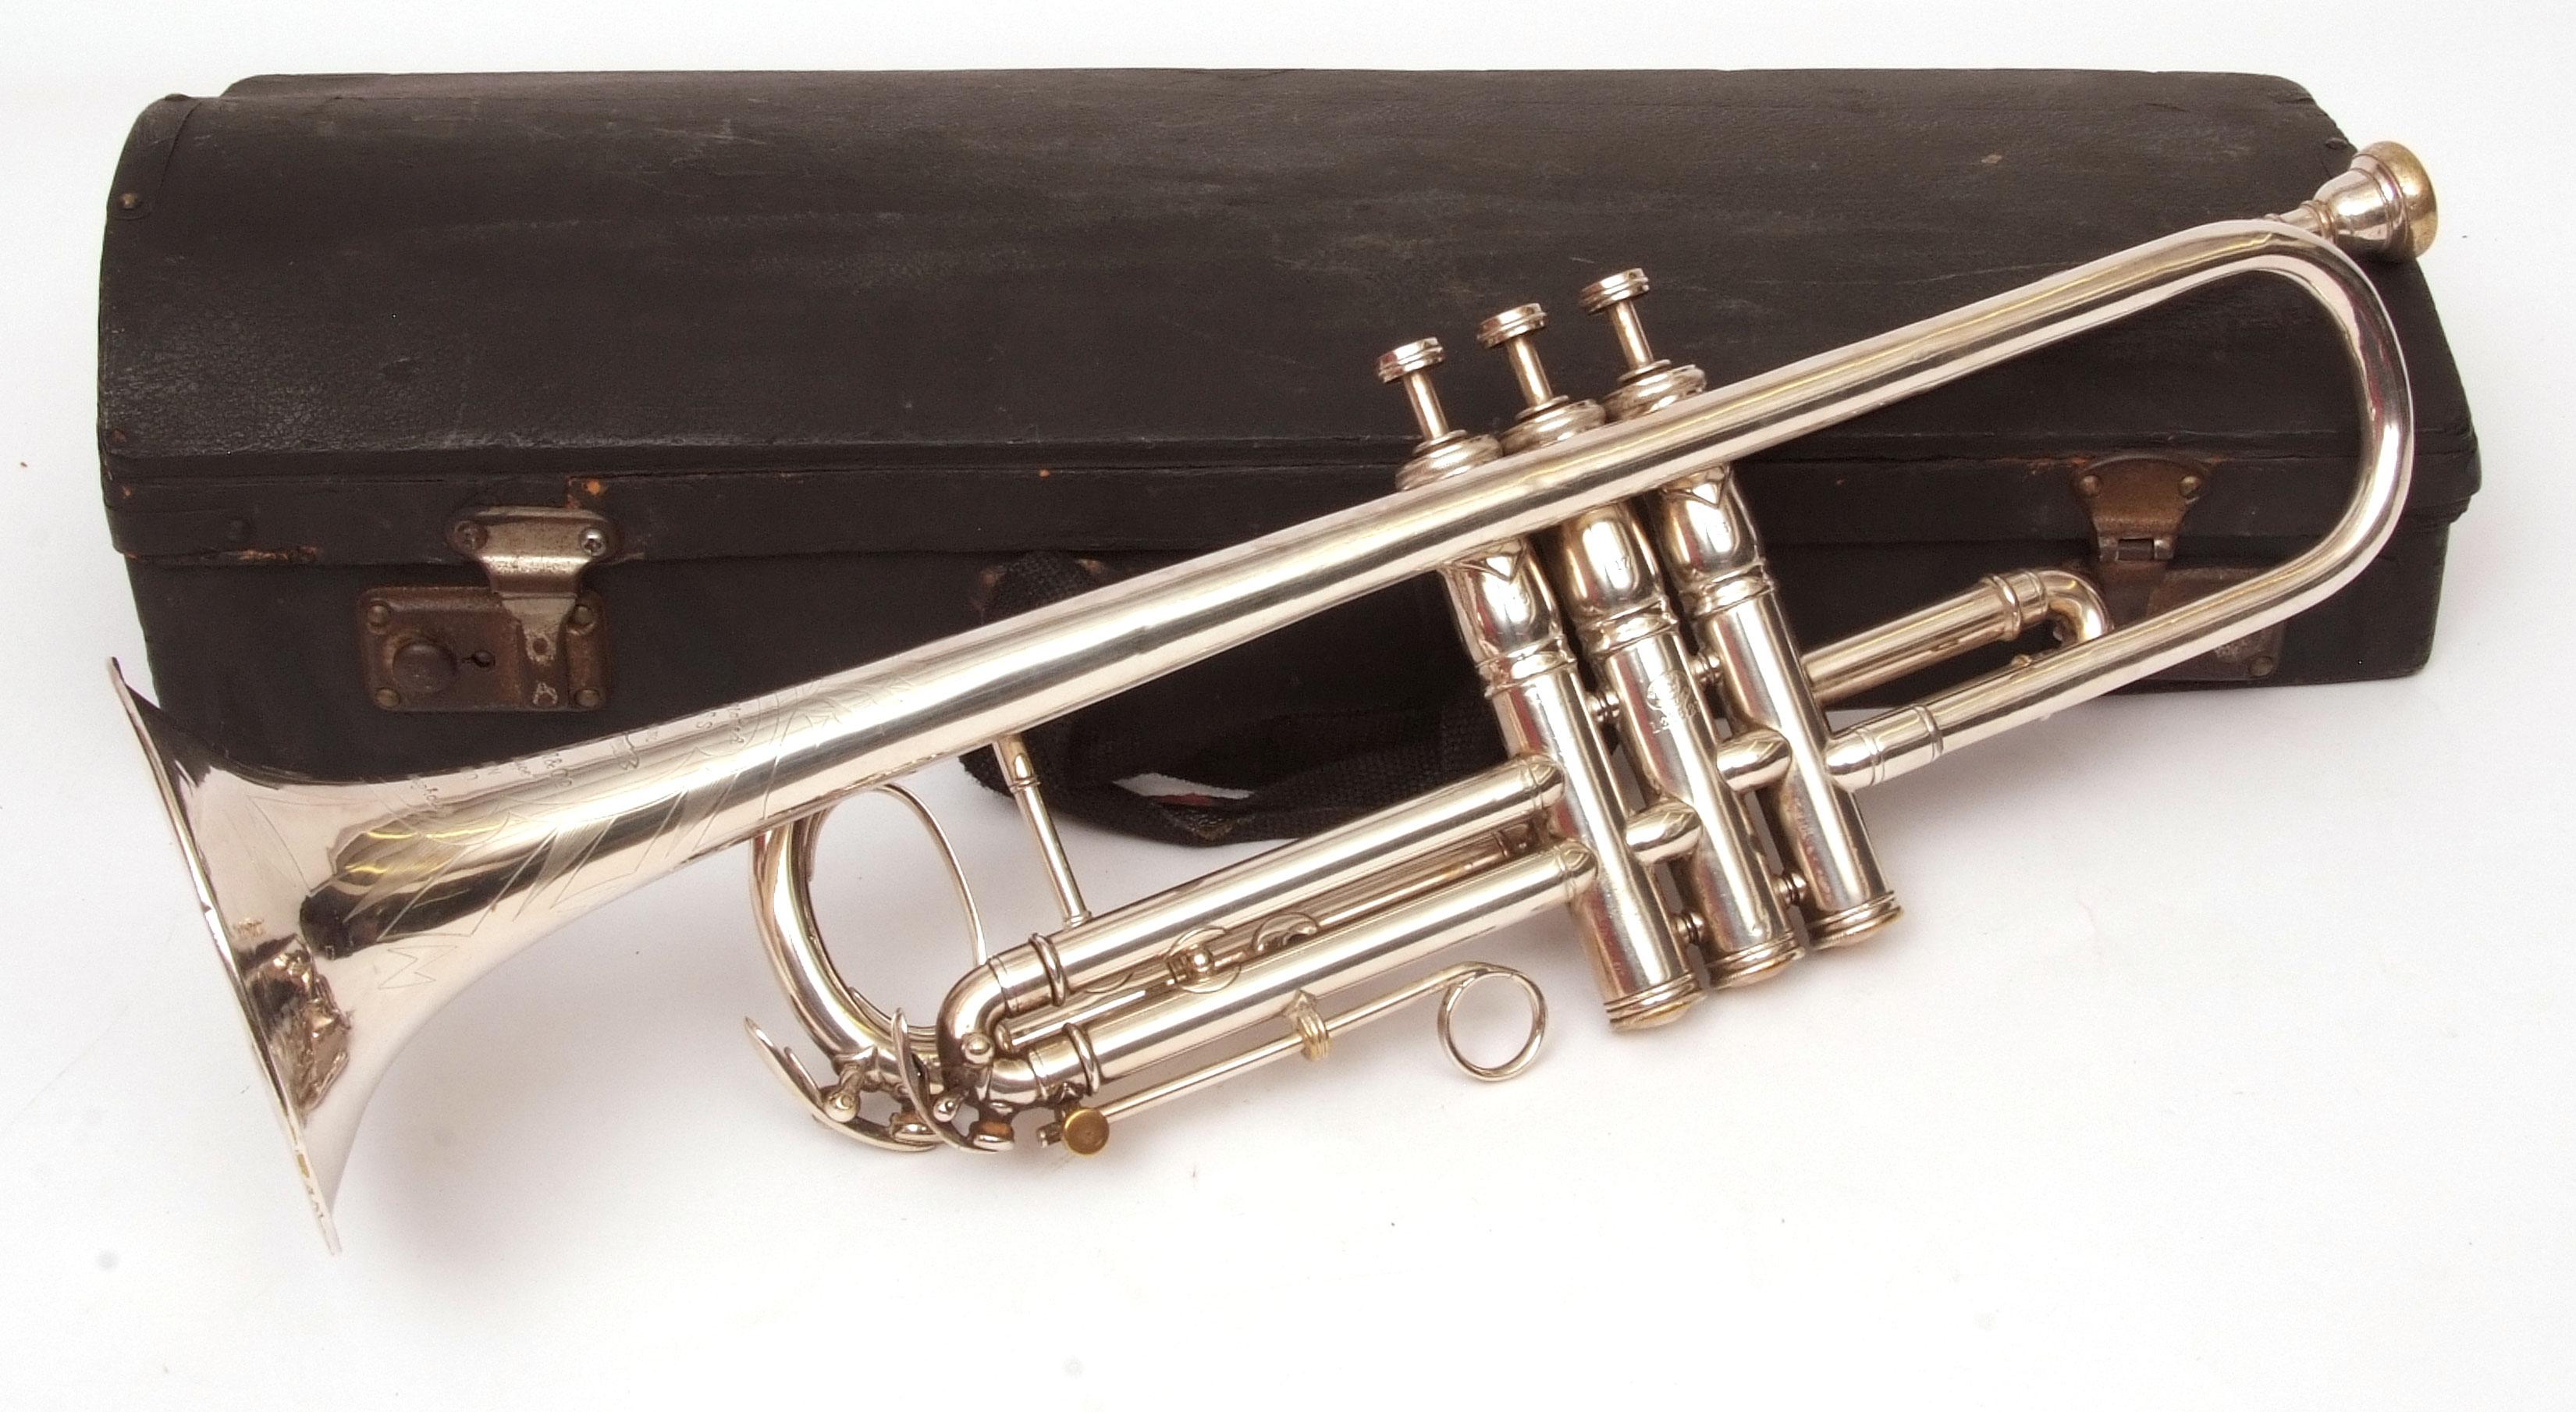 Sir Malcolm Arnold's trumpet